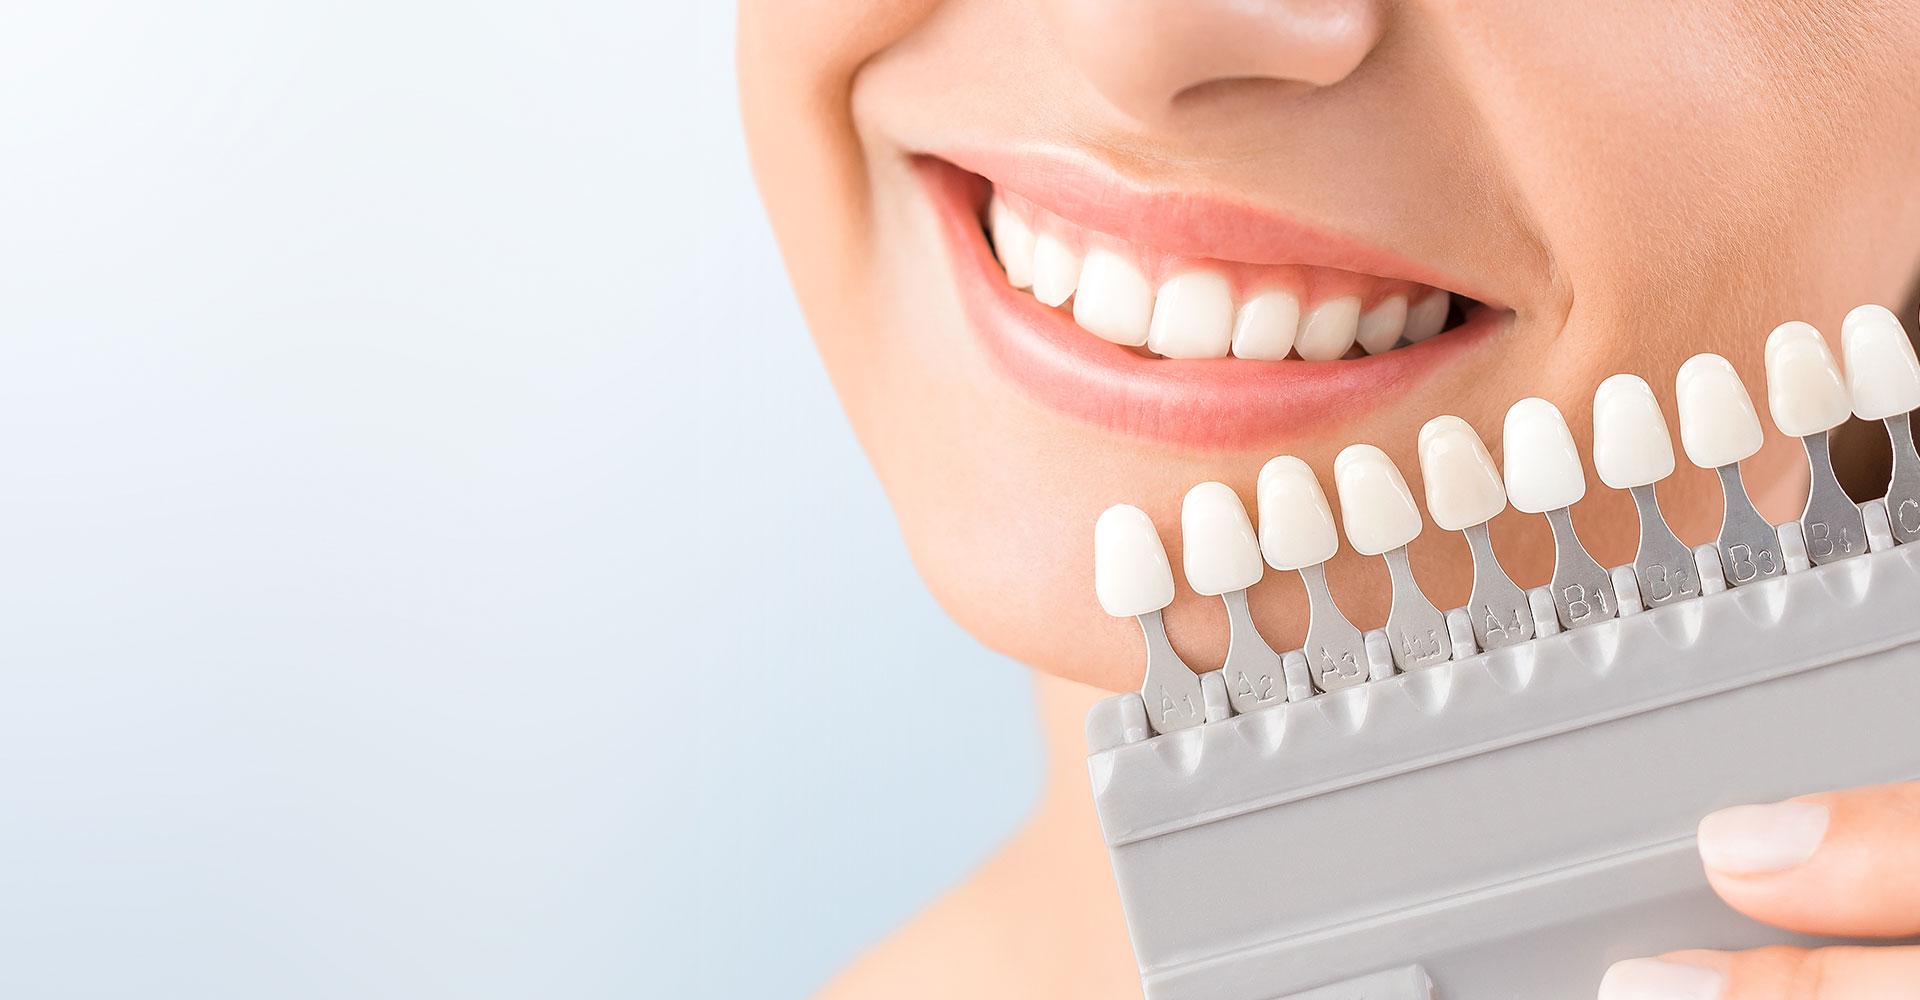 Ästhetik - Zahnärztliche Praxisklinik Dr. Borrmann